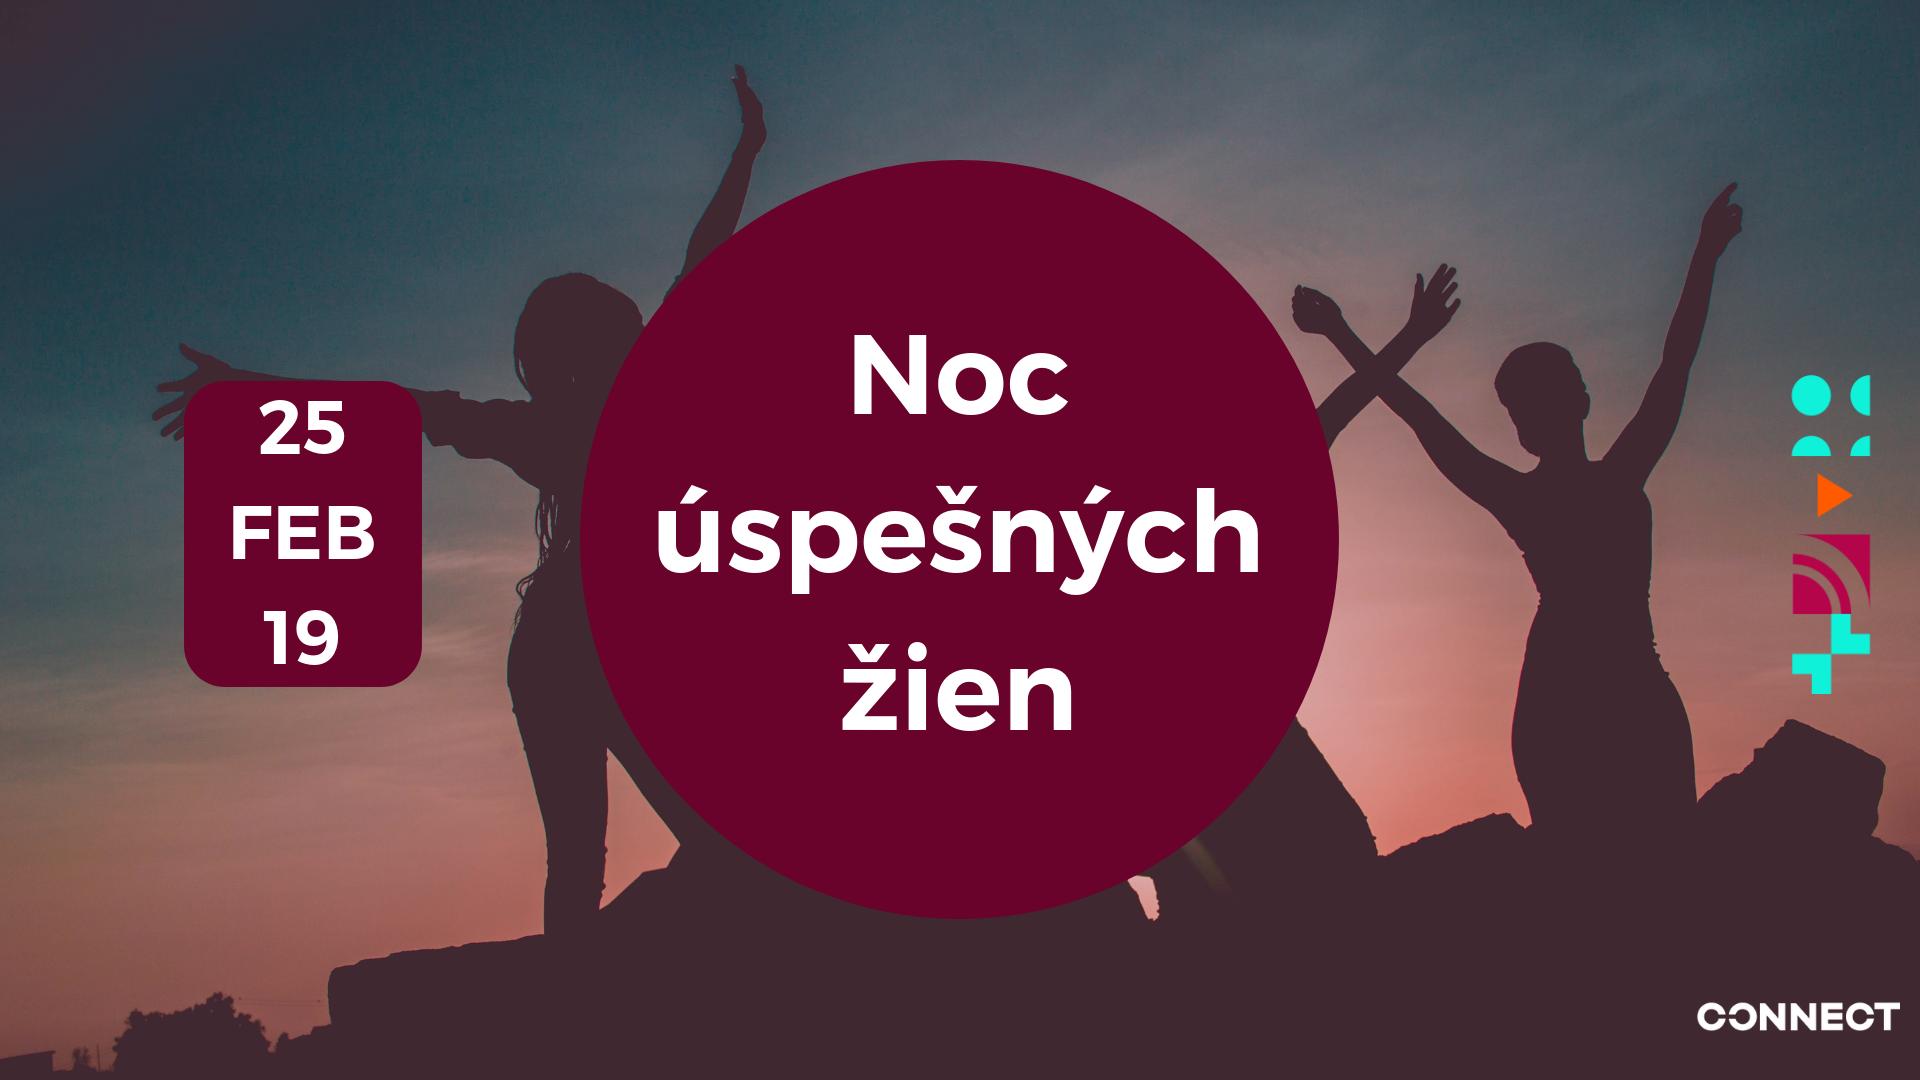 NOC úspešných žien / 25.2.2019